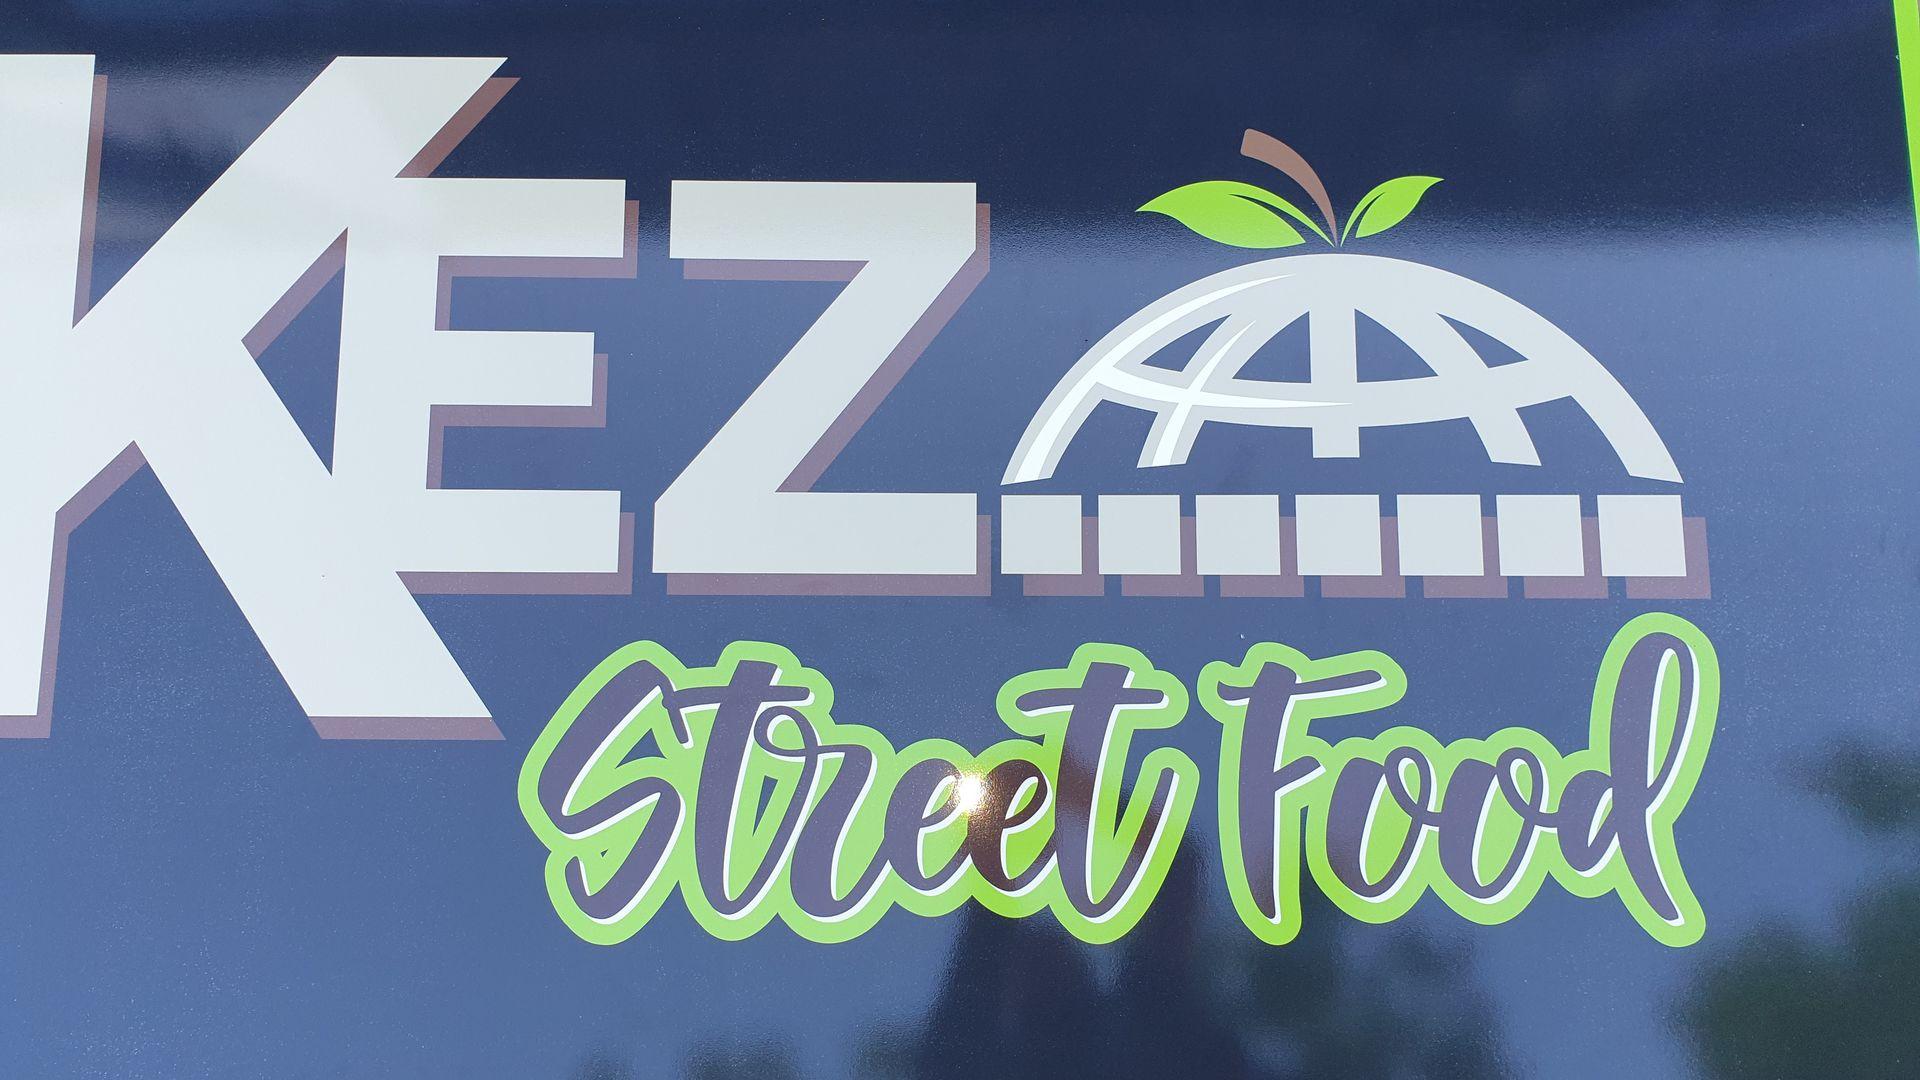 restaurant_kez_street_food_saint-brieuc__logo